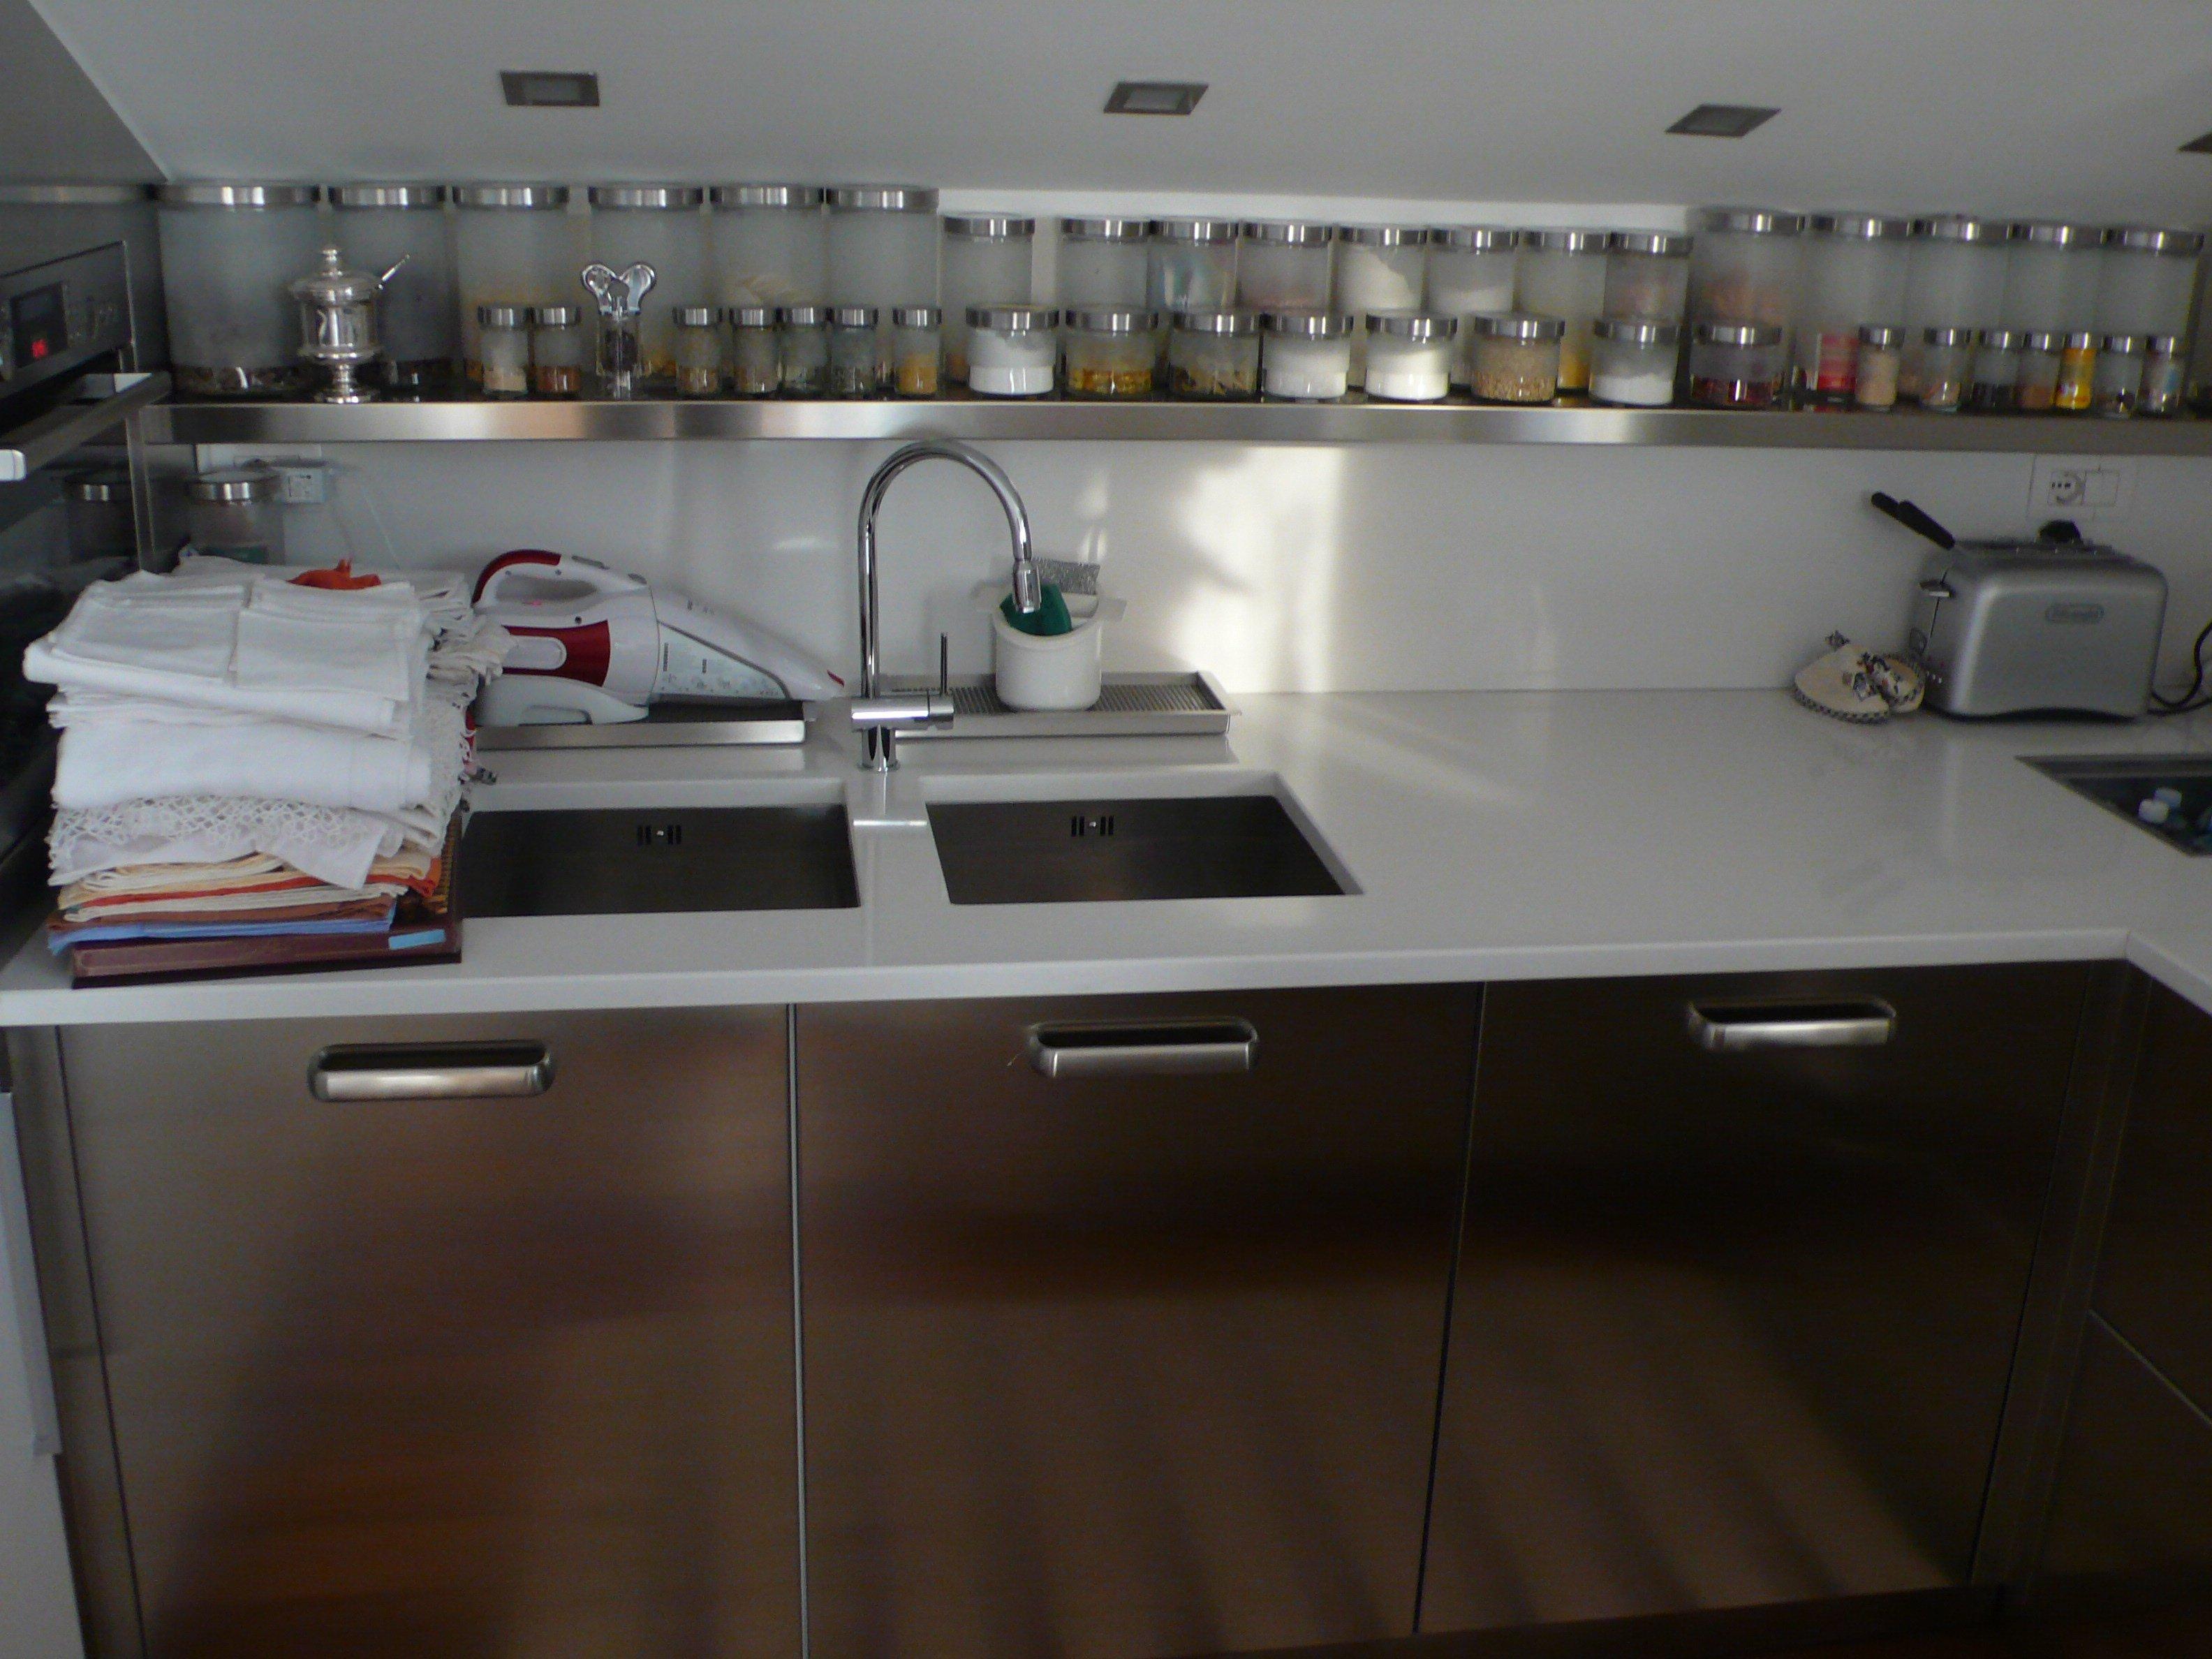 mobili cucina arredo legno 5